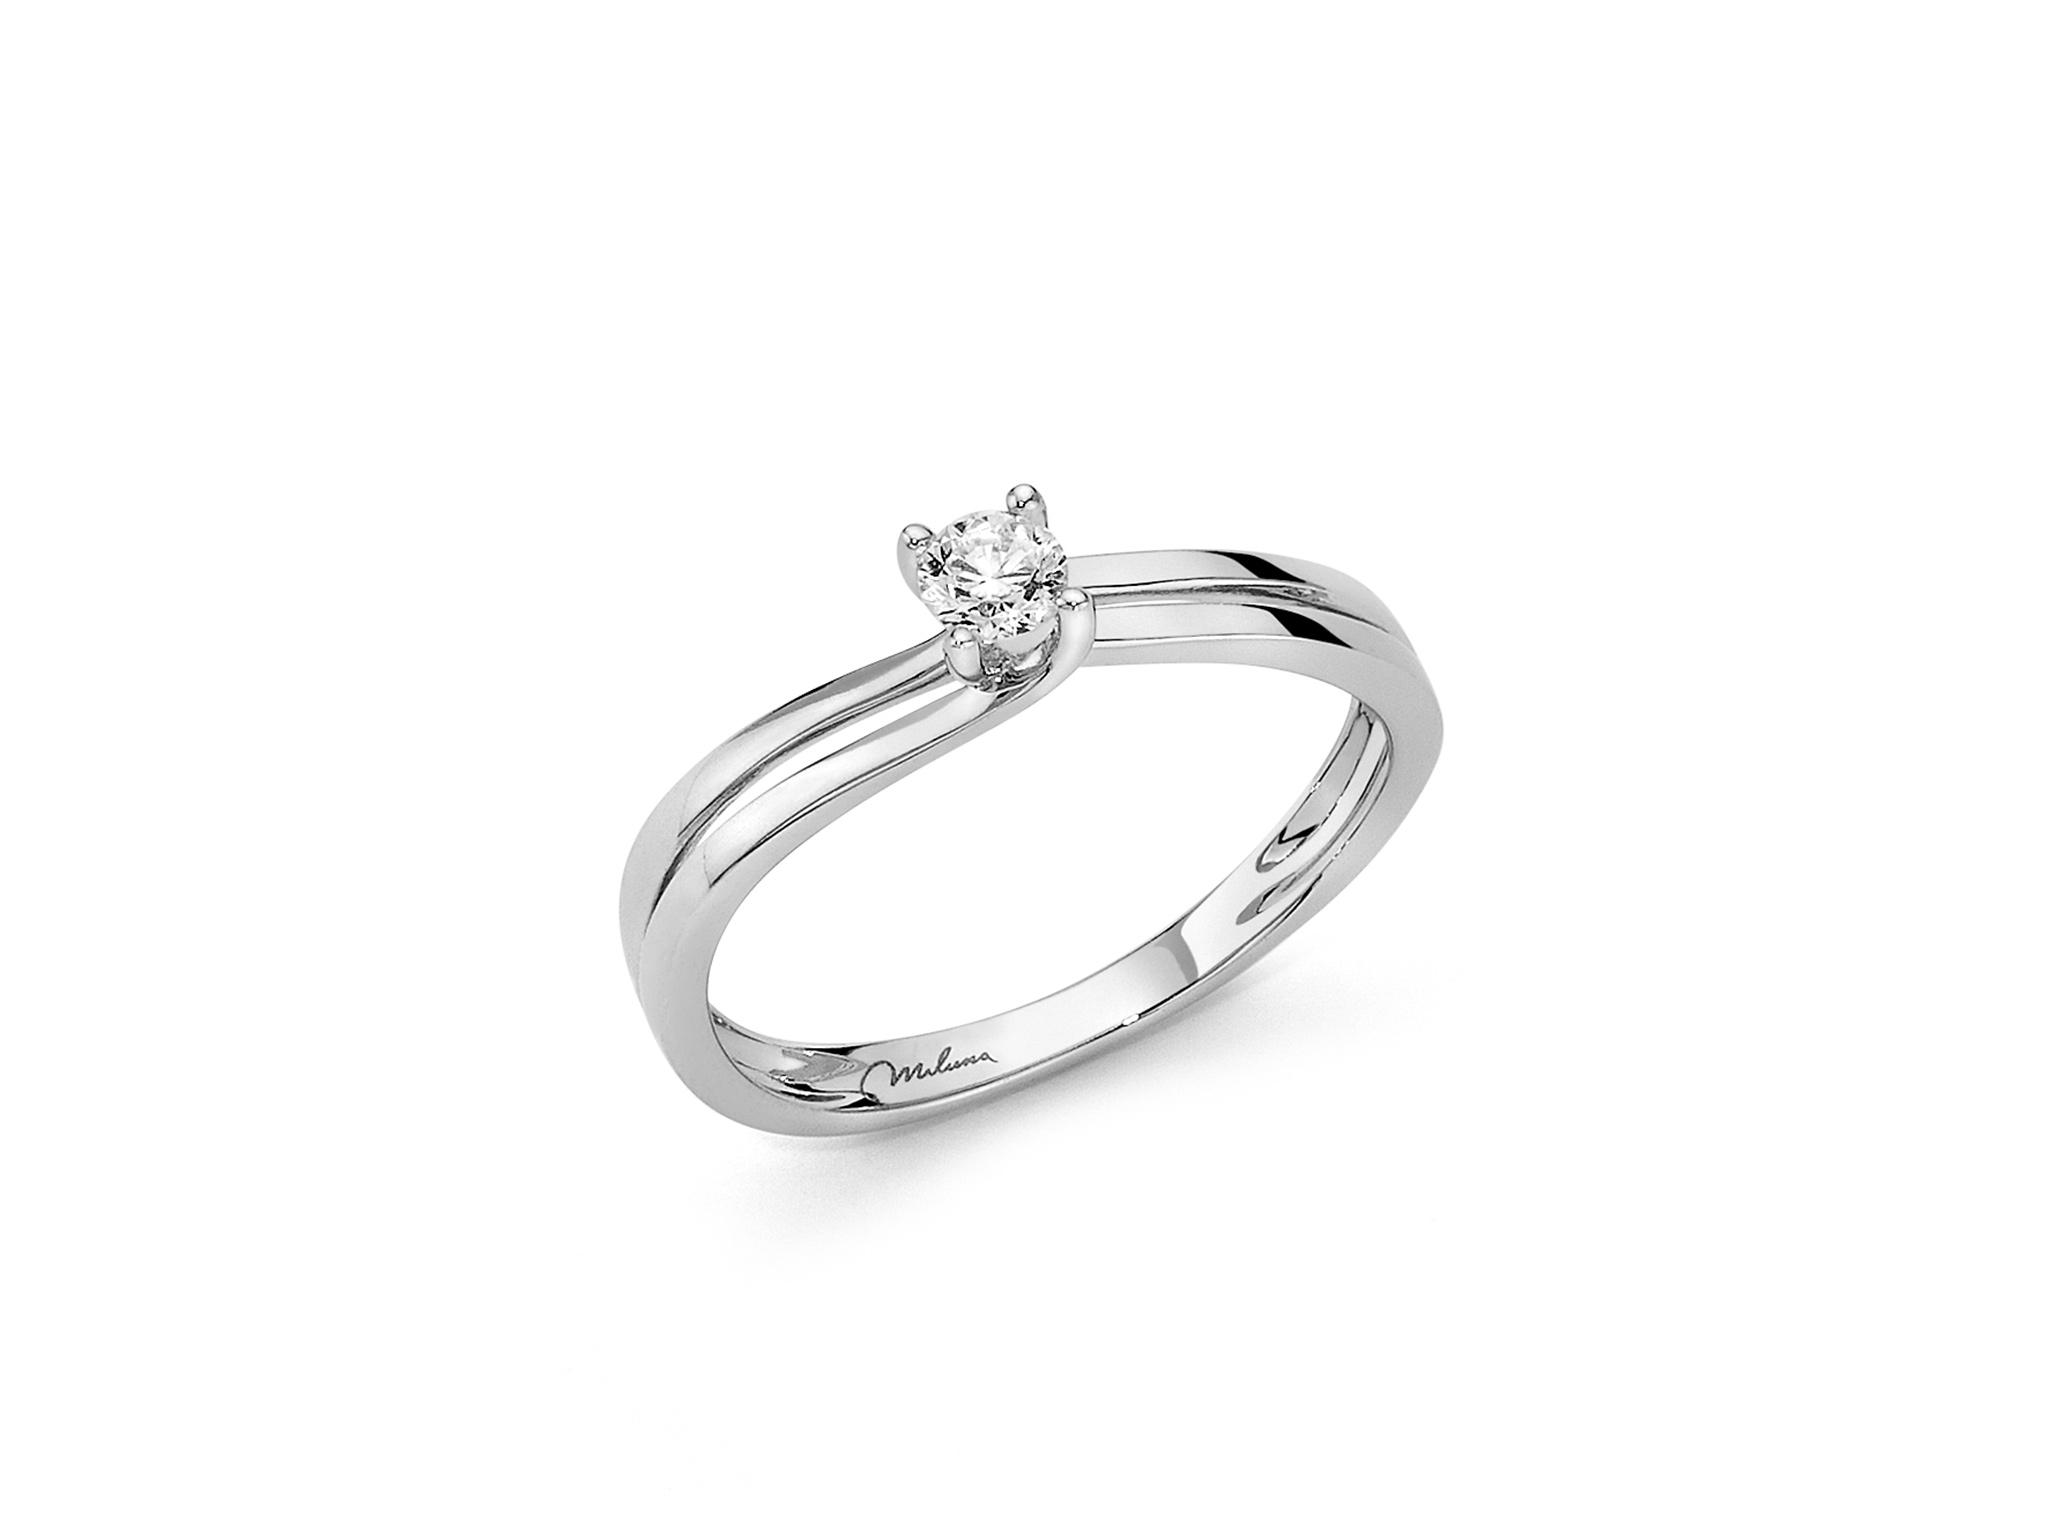 Solitario fantasia in oro e diamante. - LID3301-030G7